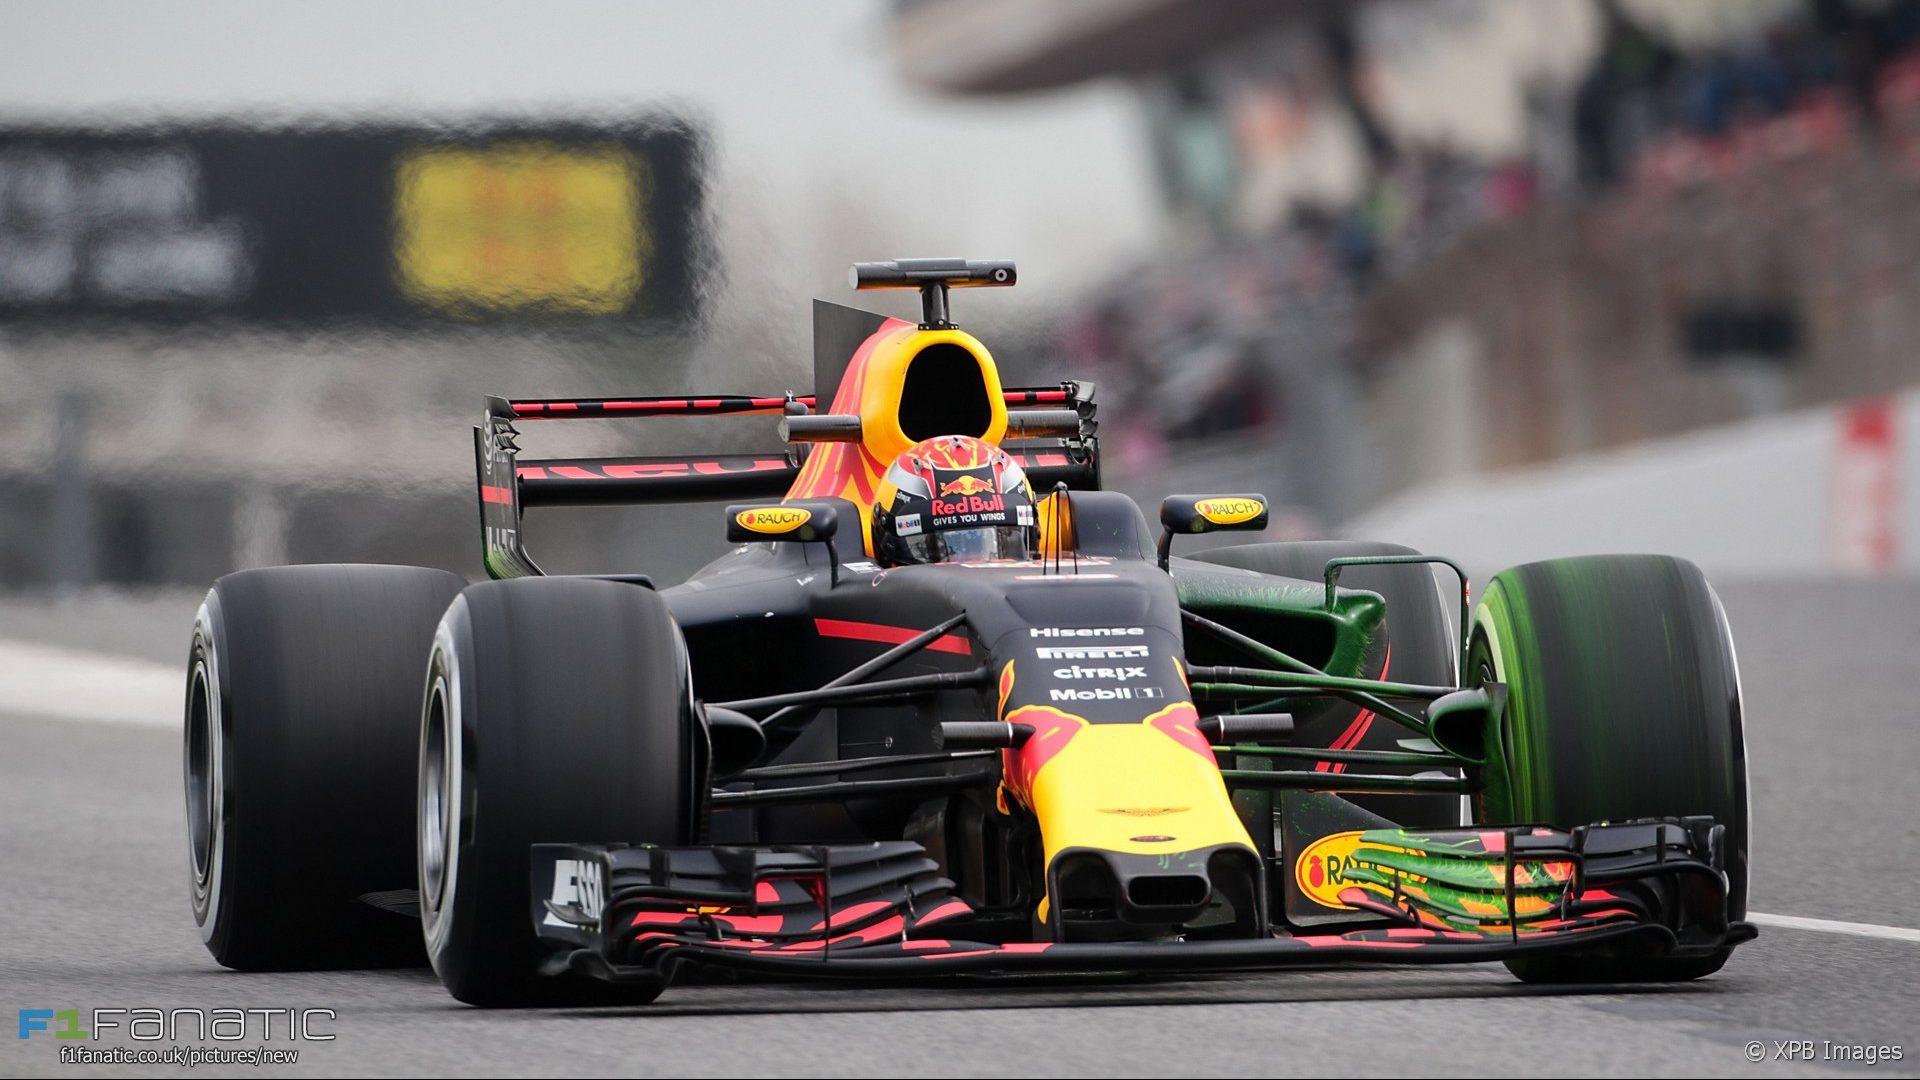 F1 verstappen wallpaper 7